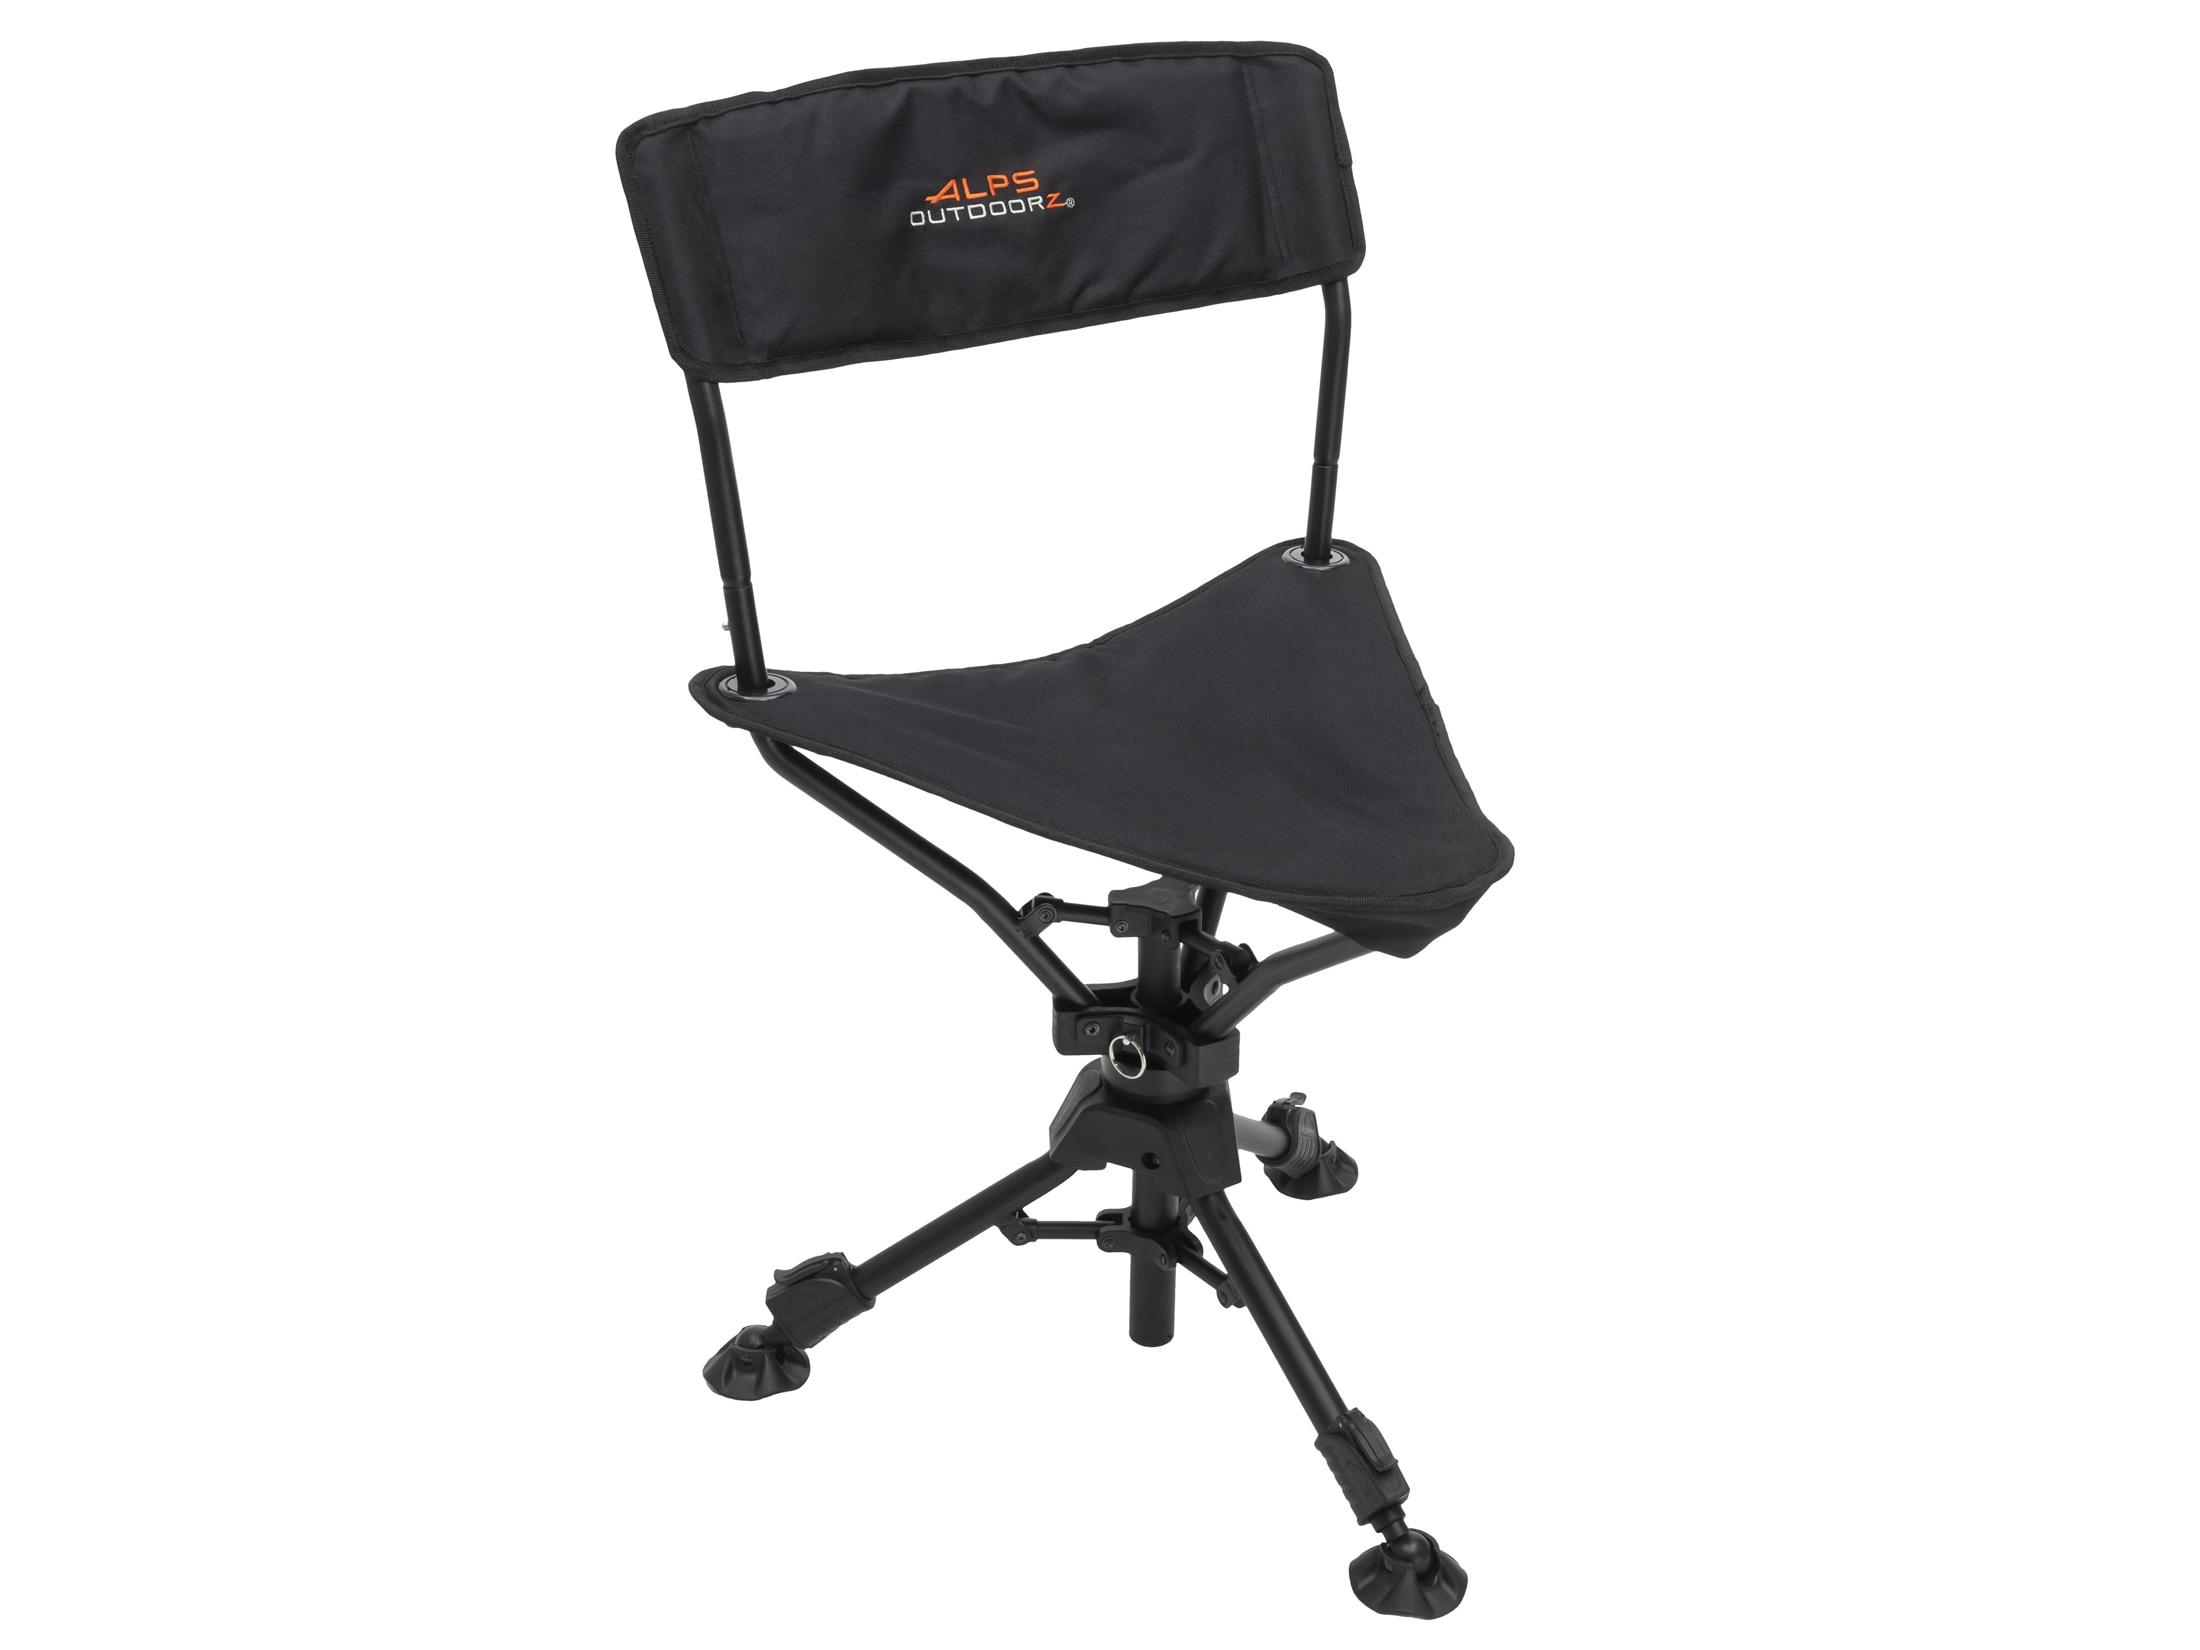 Incredible Alps Outdoorz Triad 360 Degree Tripod Chair Black Cjindustries Chair Design For Home Cjindustriesco